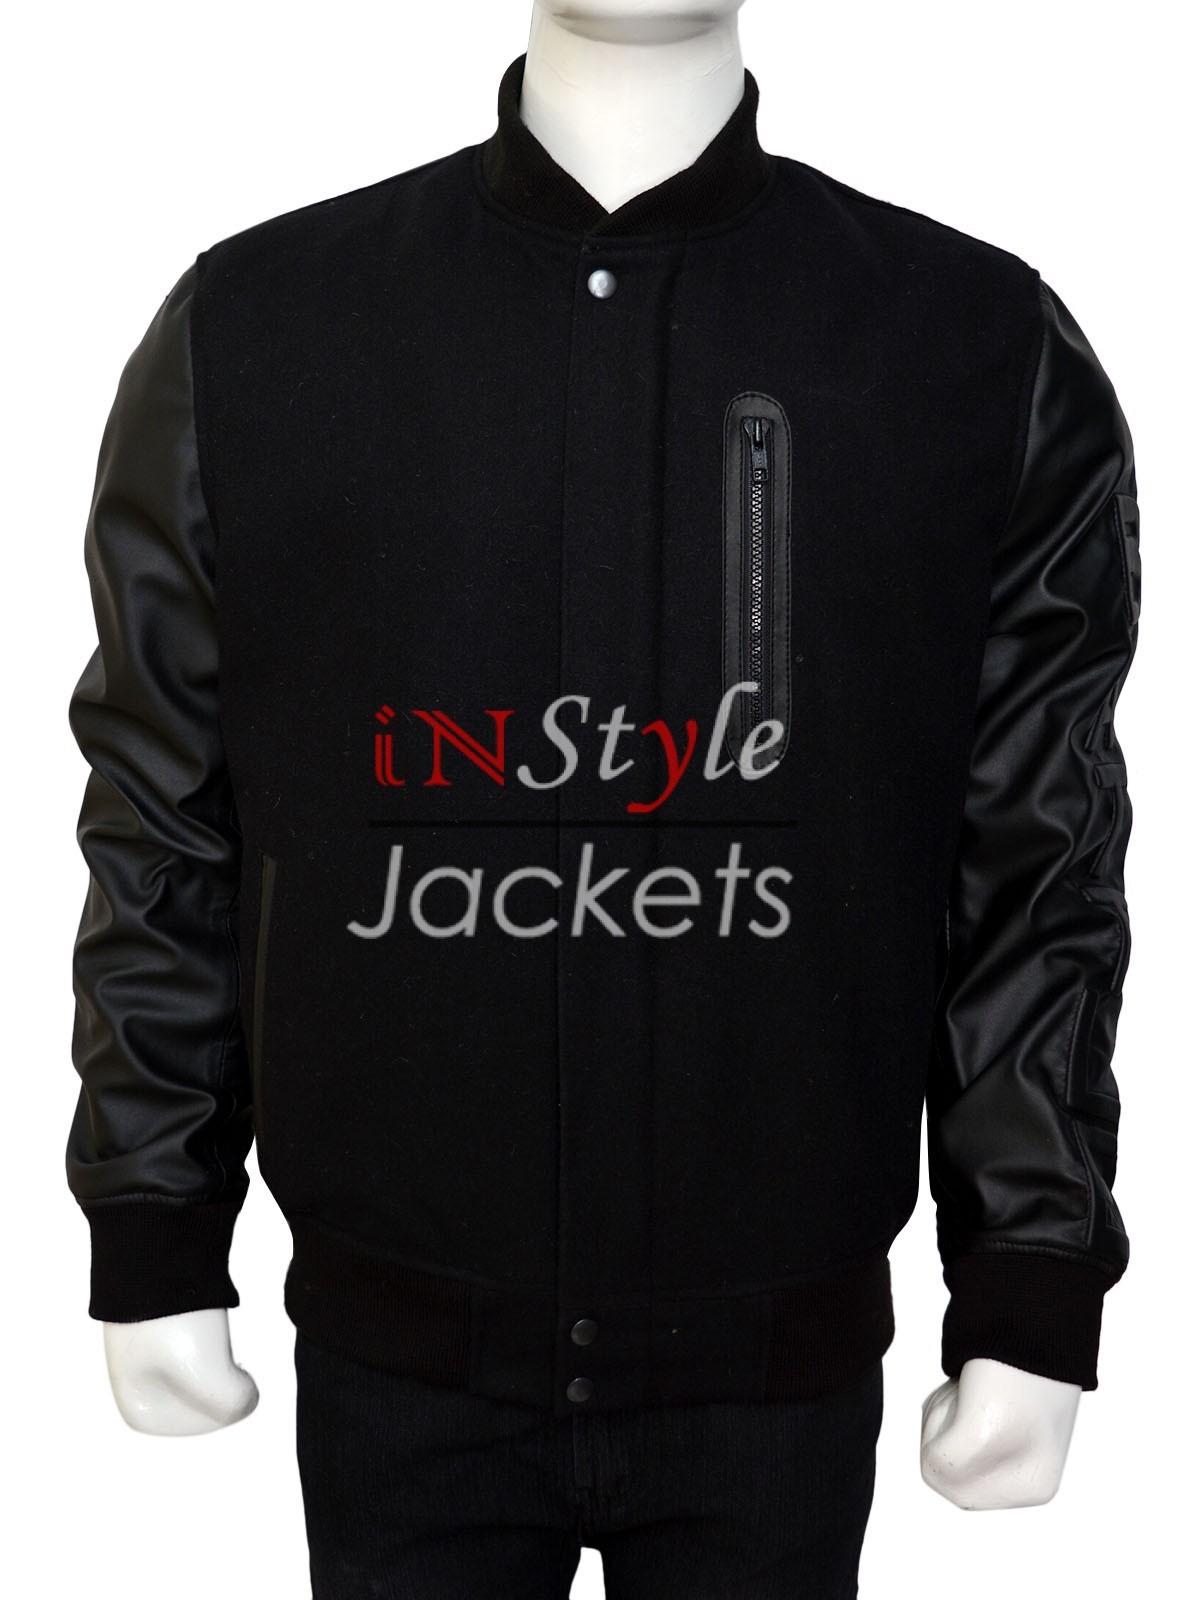 100e013edd53be Instyle Jackets Michael B Jordan Creed 2015 Movie Black Jacket